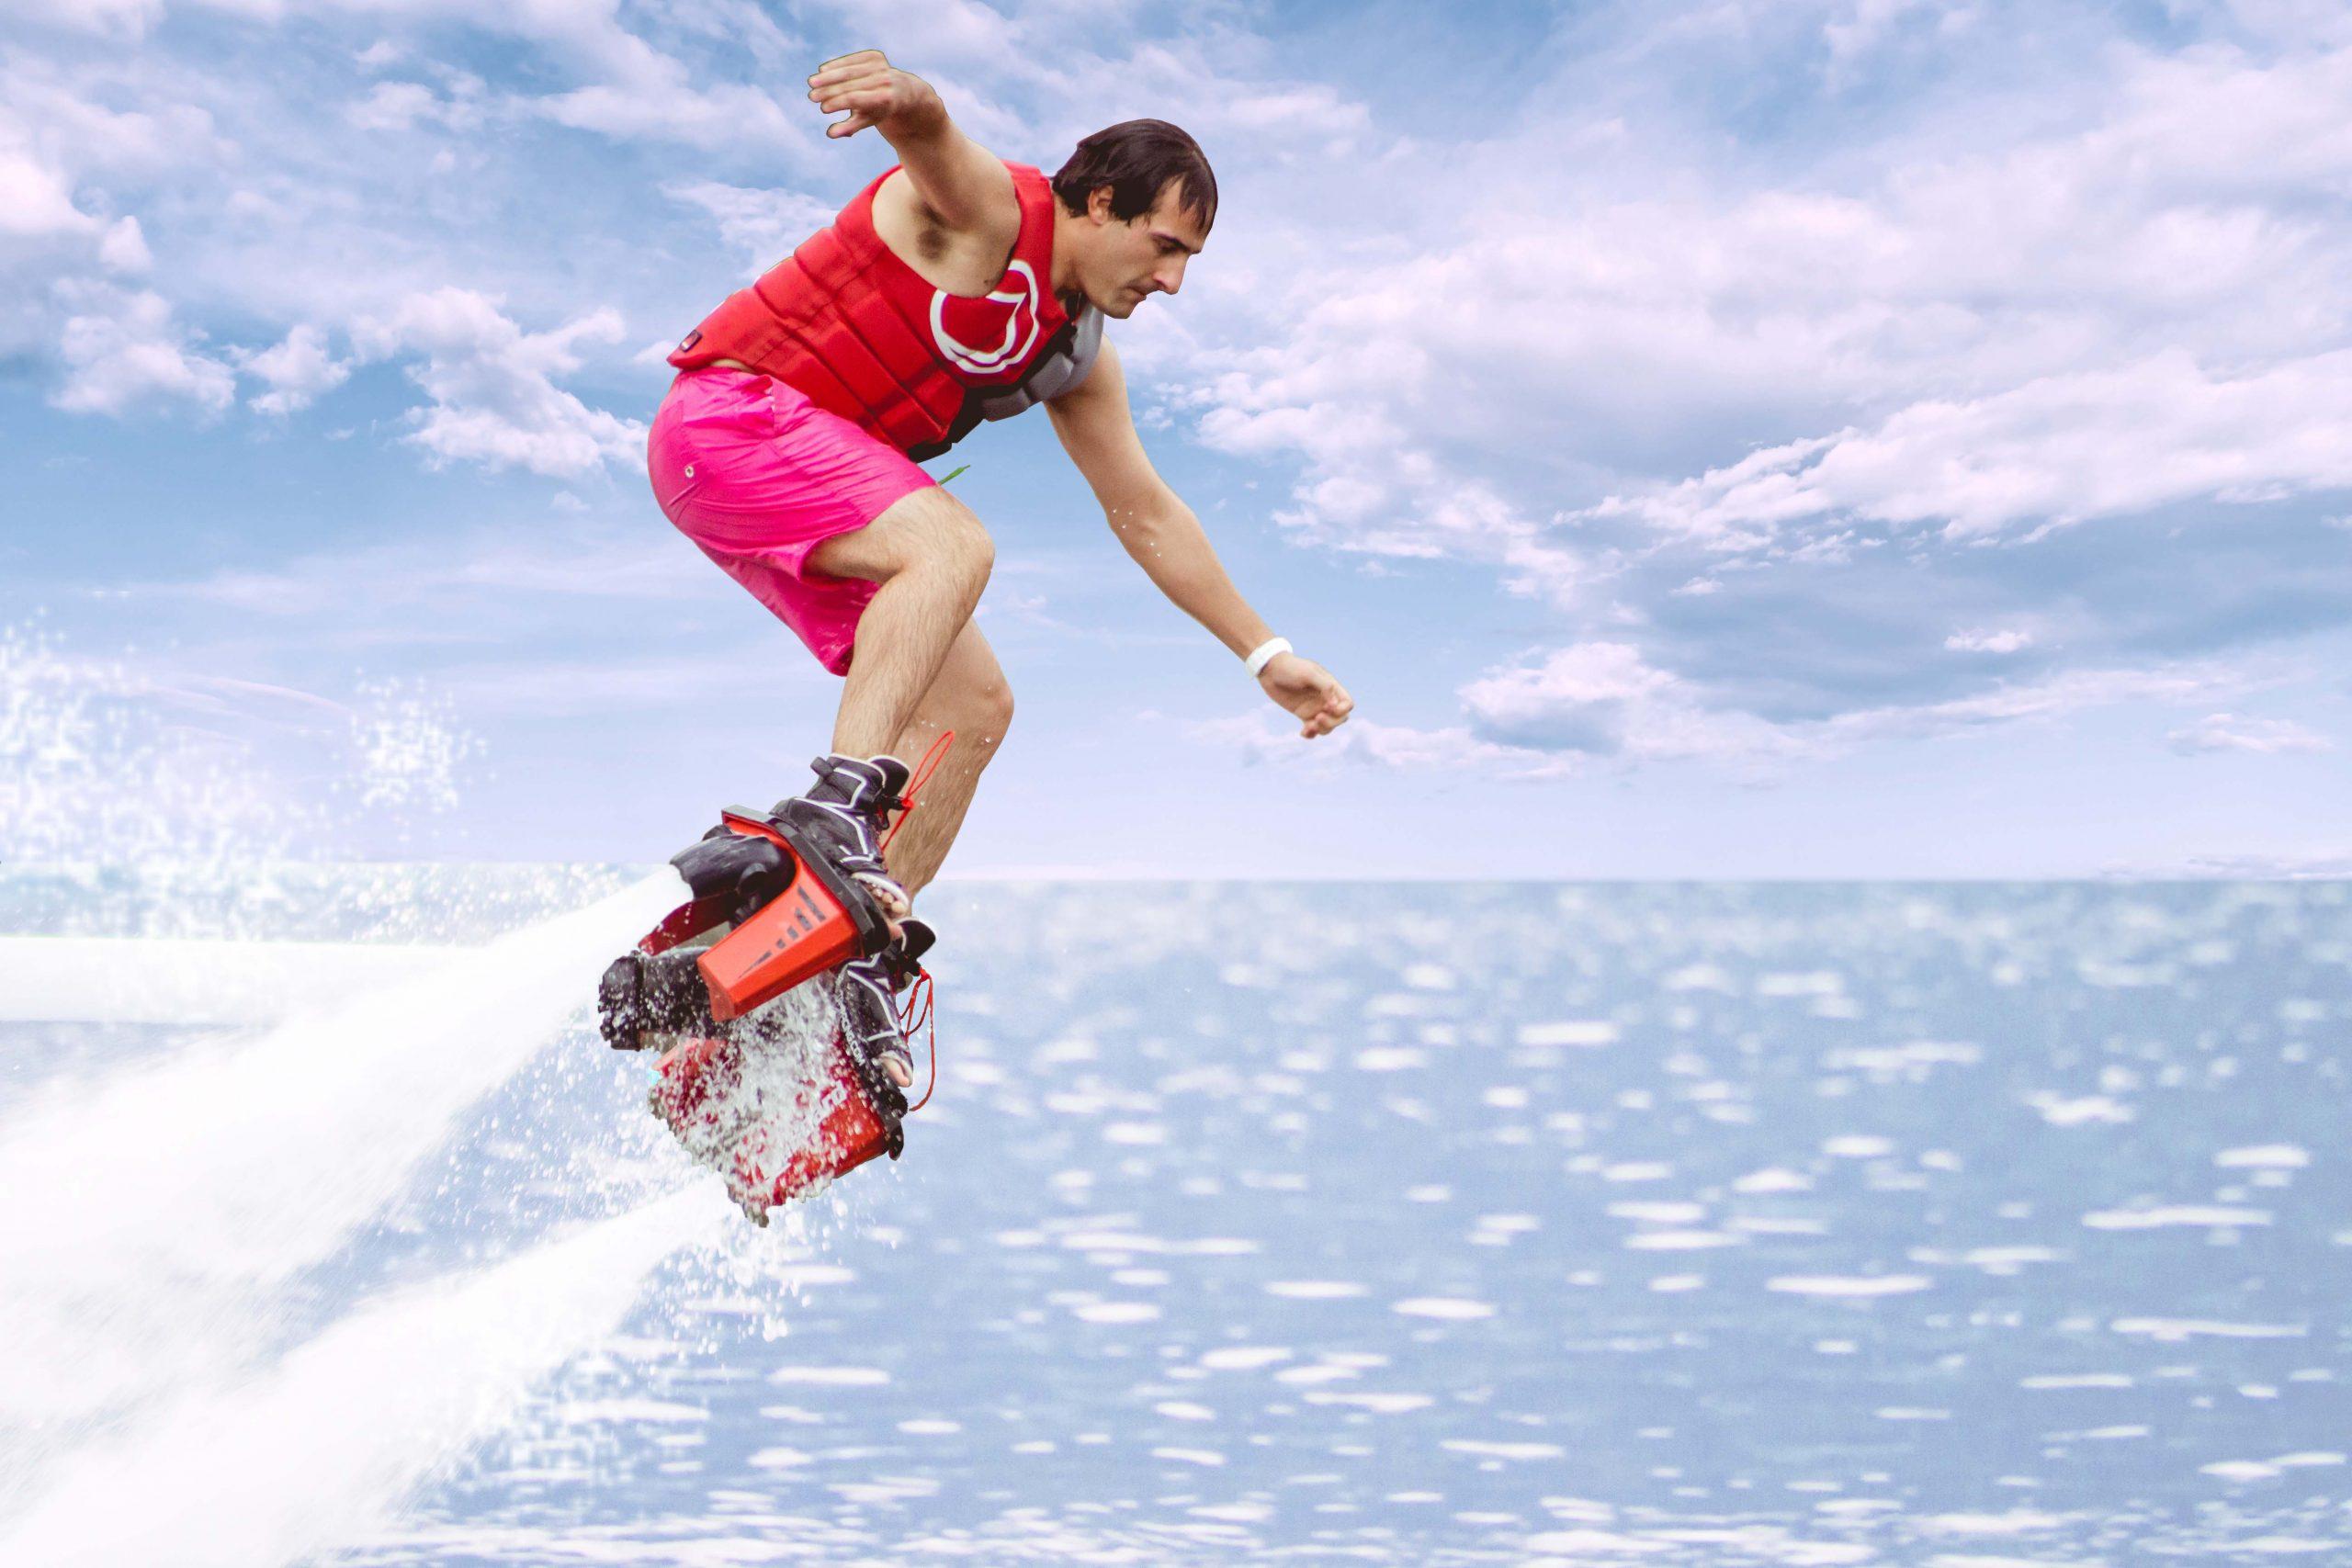 flyboard-tanjung-benoa-bali